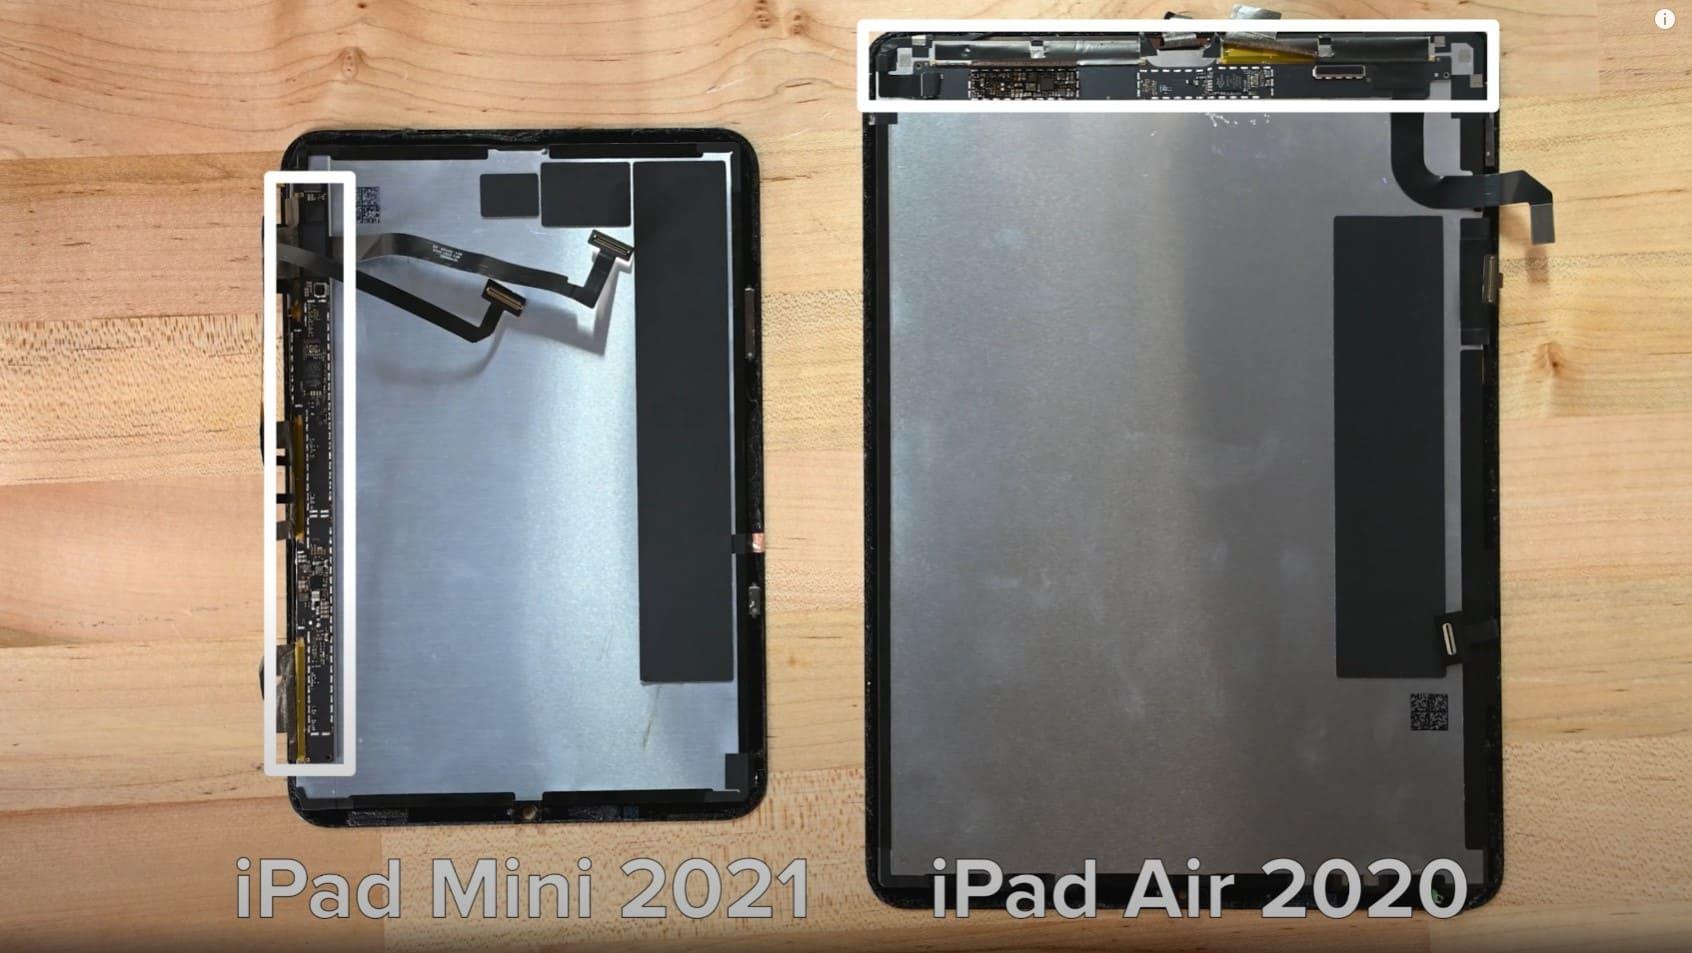 pantalla-efecto-gelantina-iPad-Mini-2021-interior